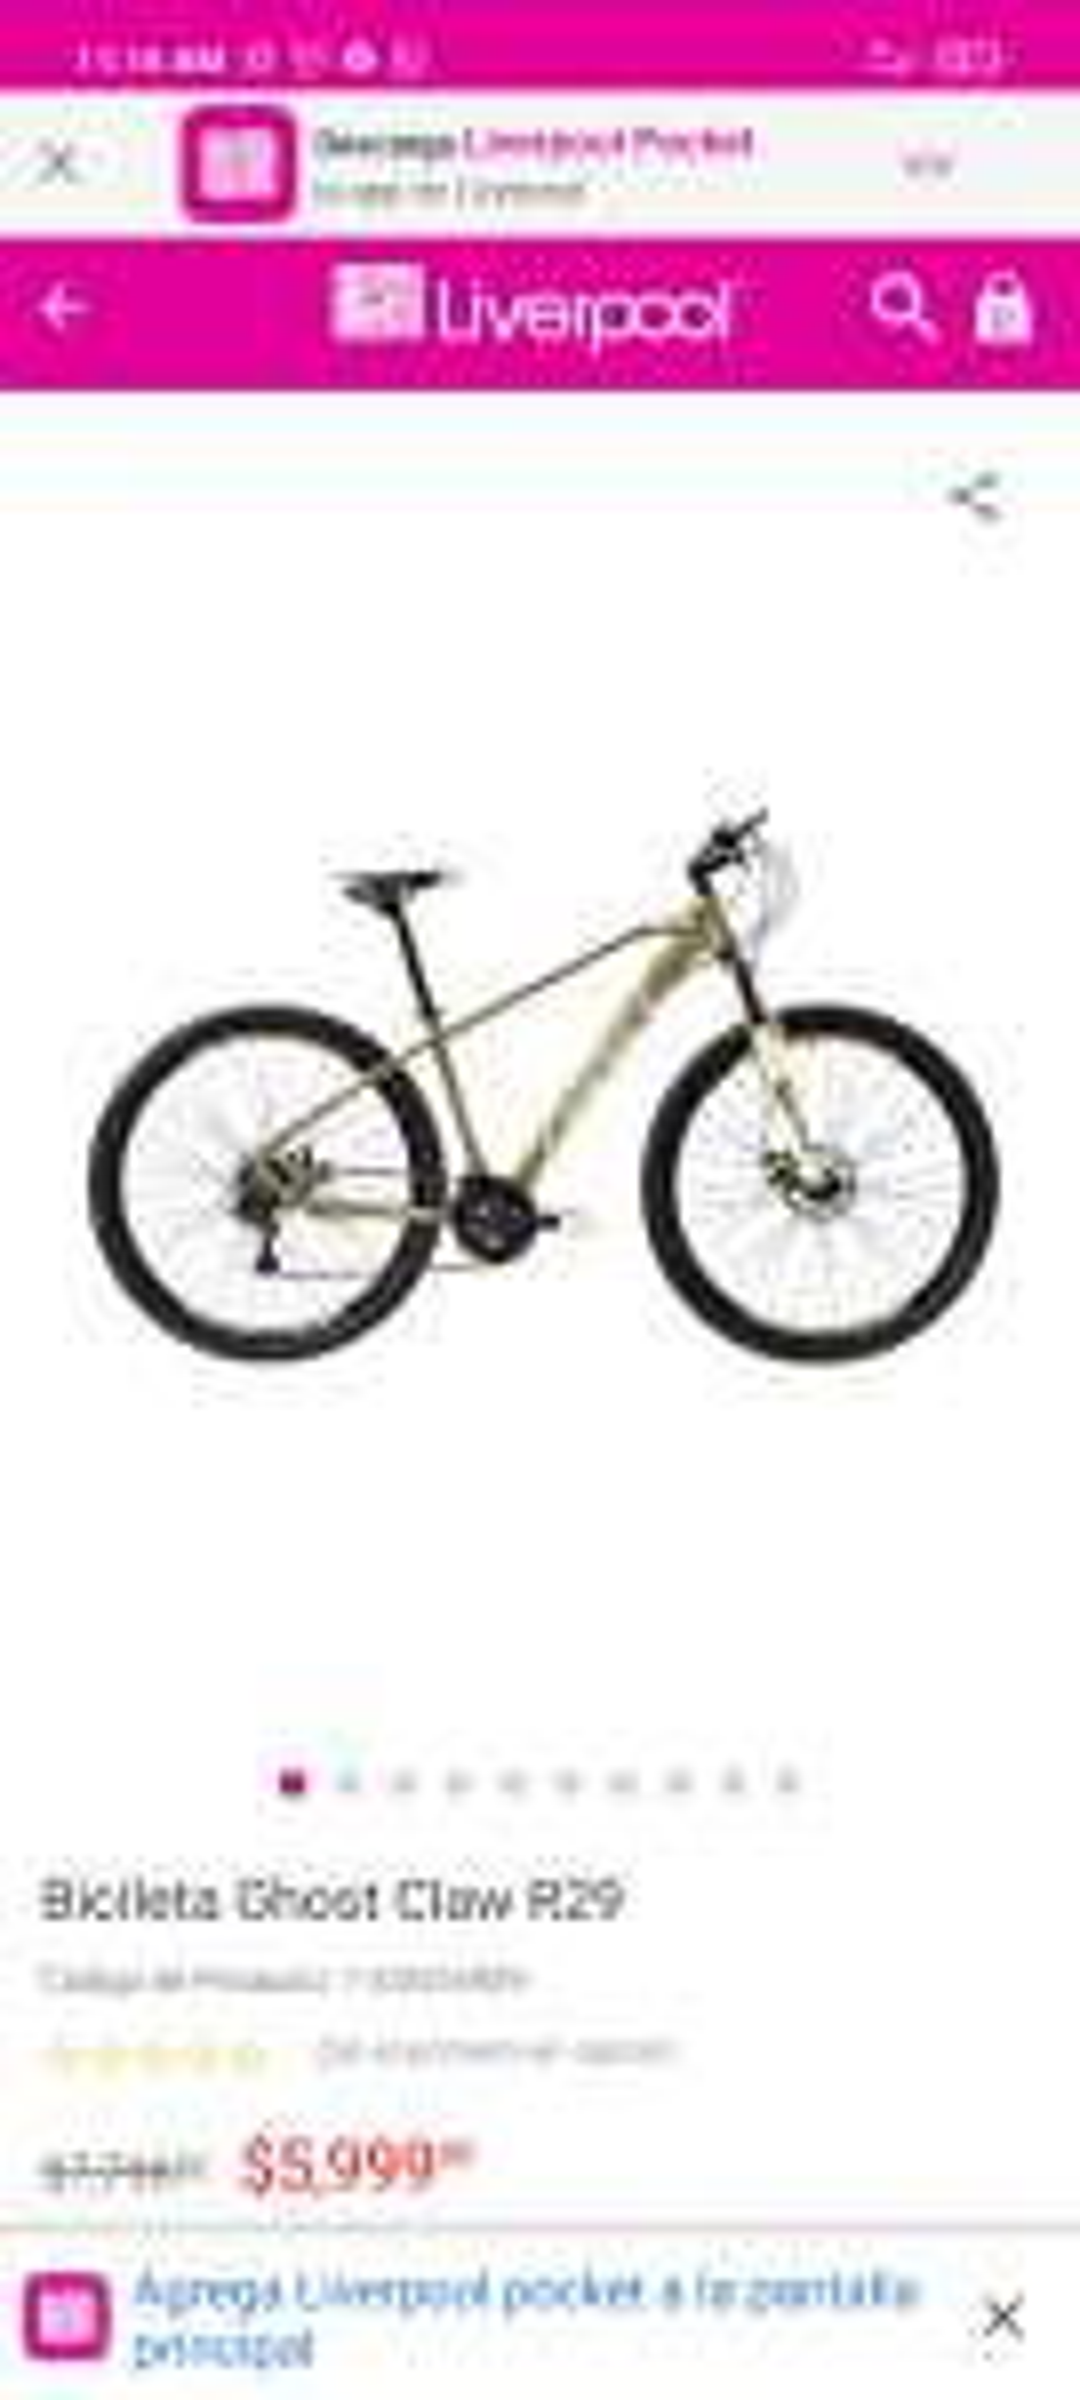 Liverpool: Bicicleta Ghost Claw R29